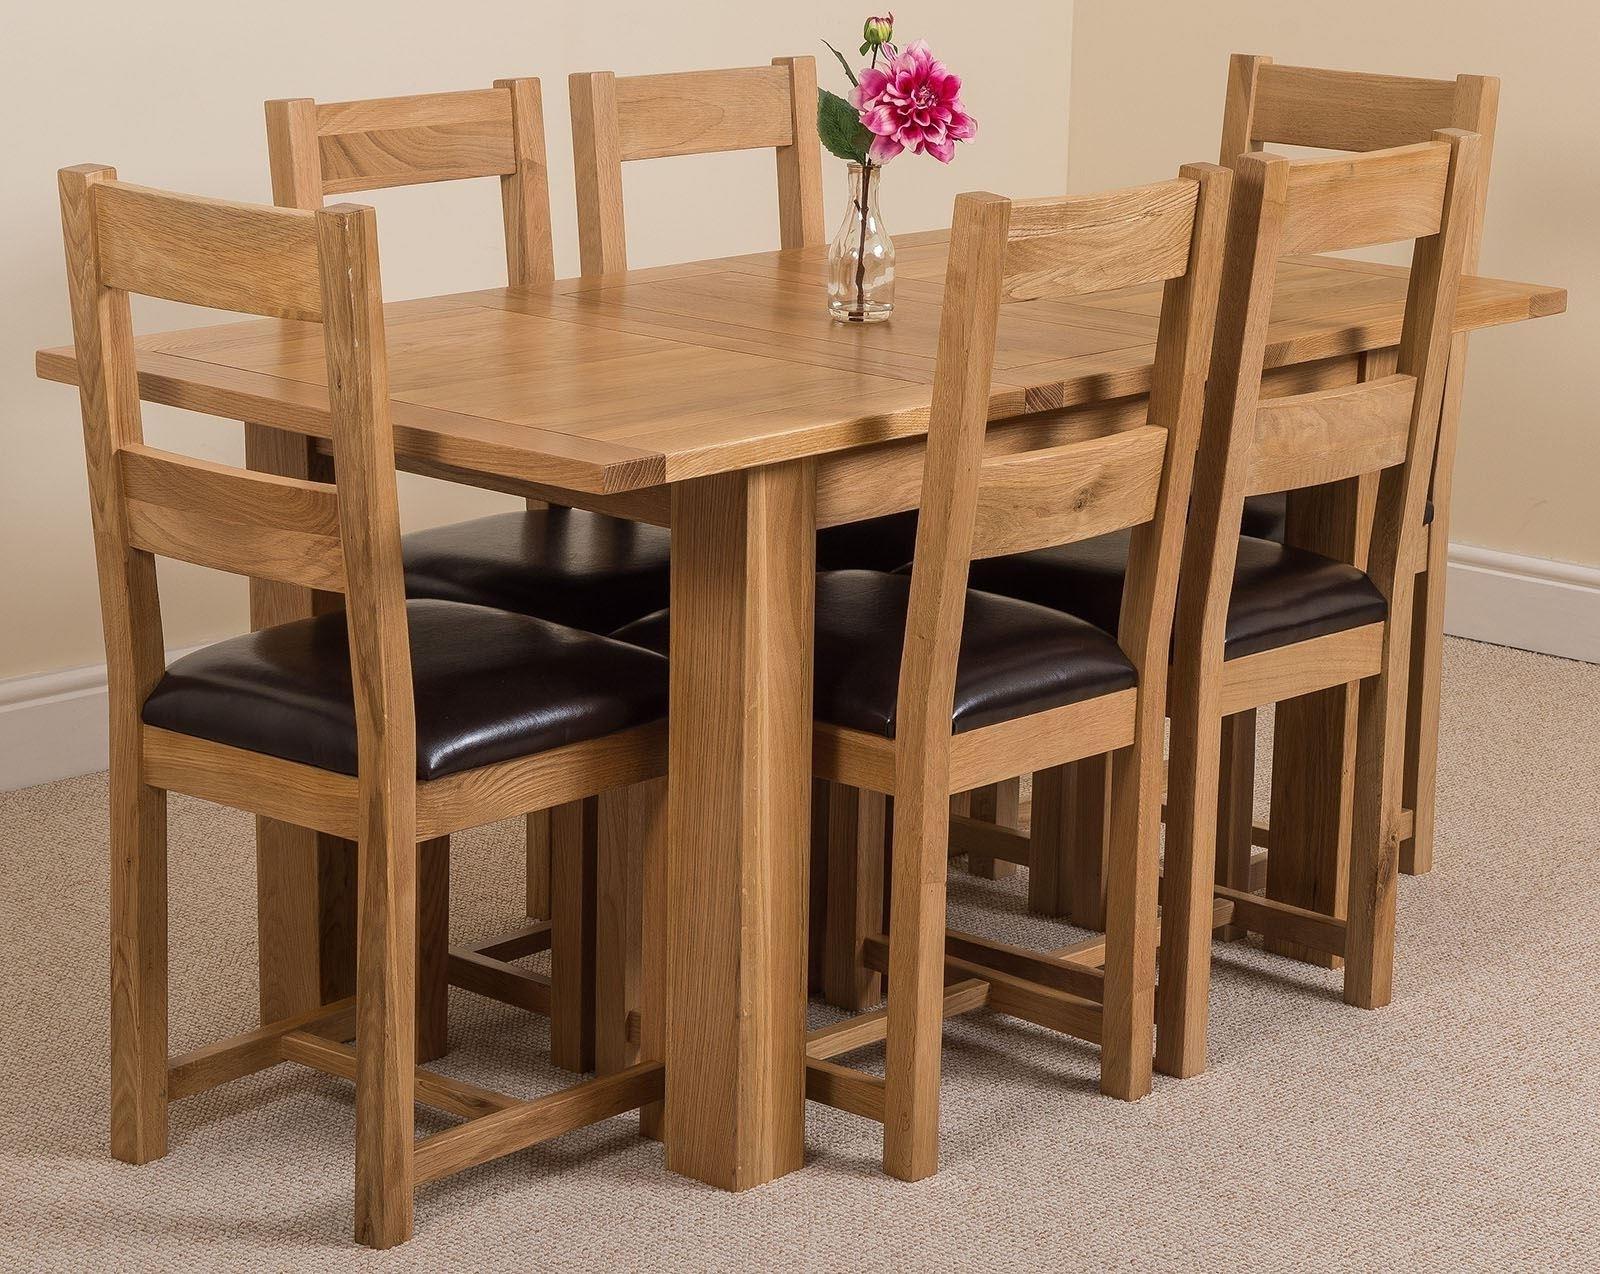 Oak Furniture King (View 12 of 25)